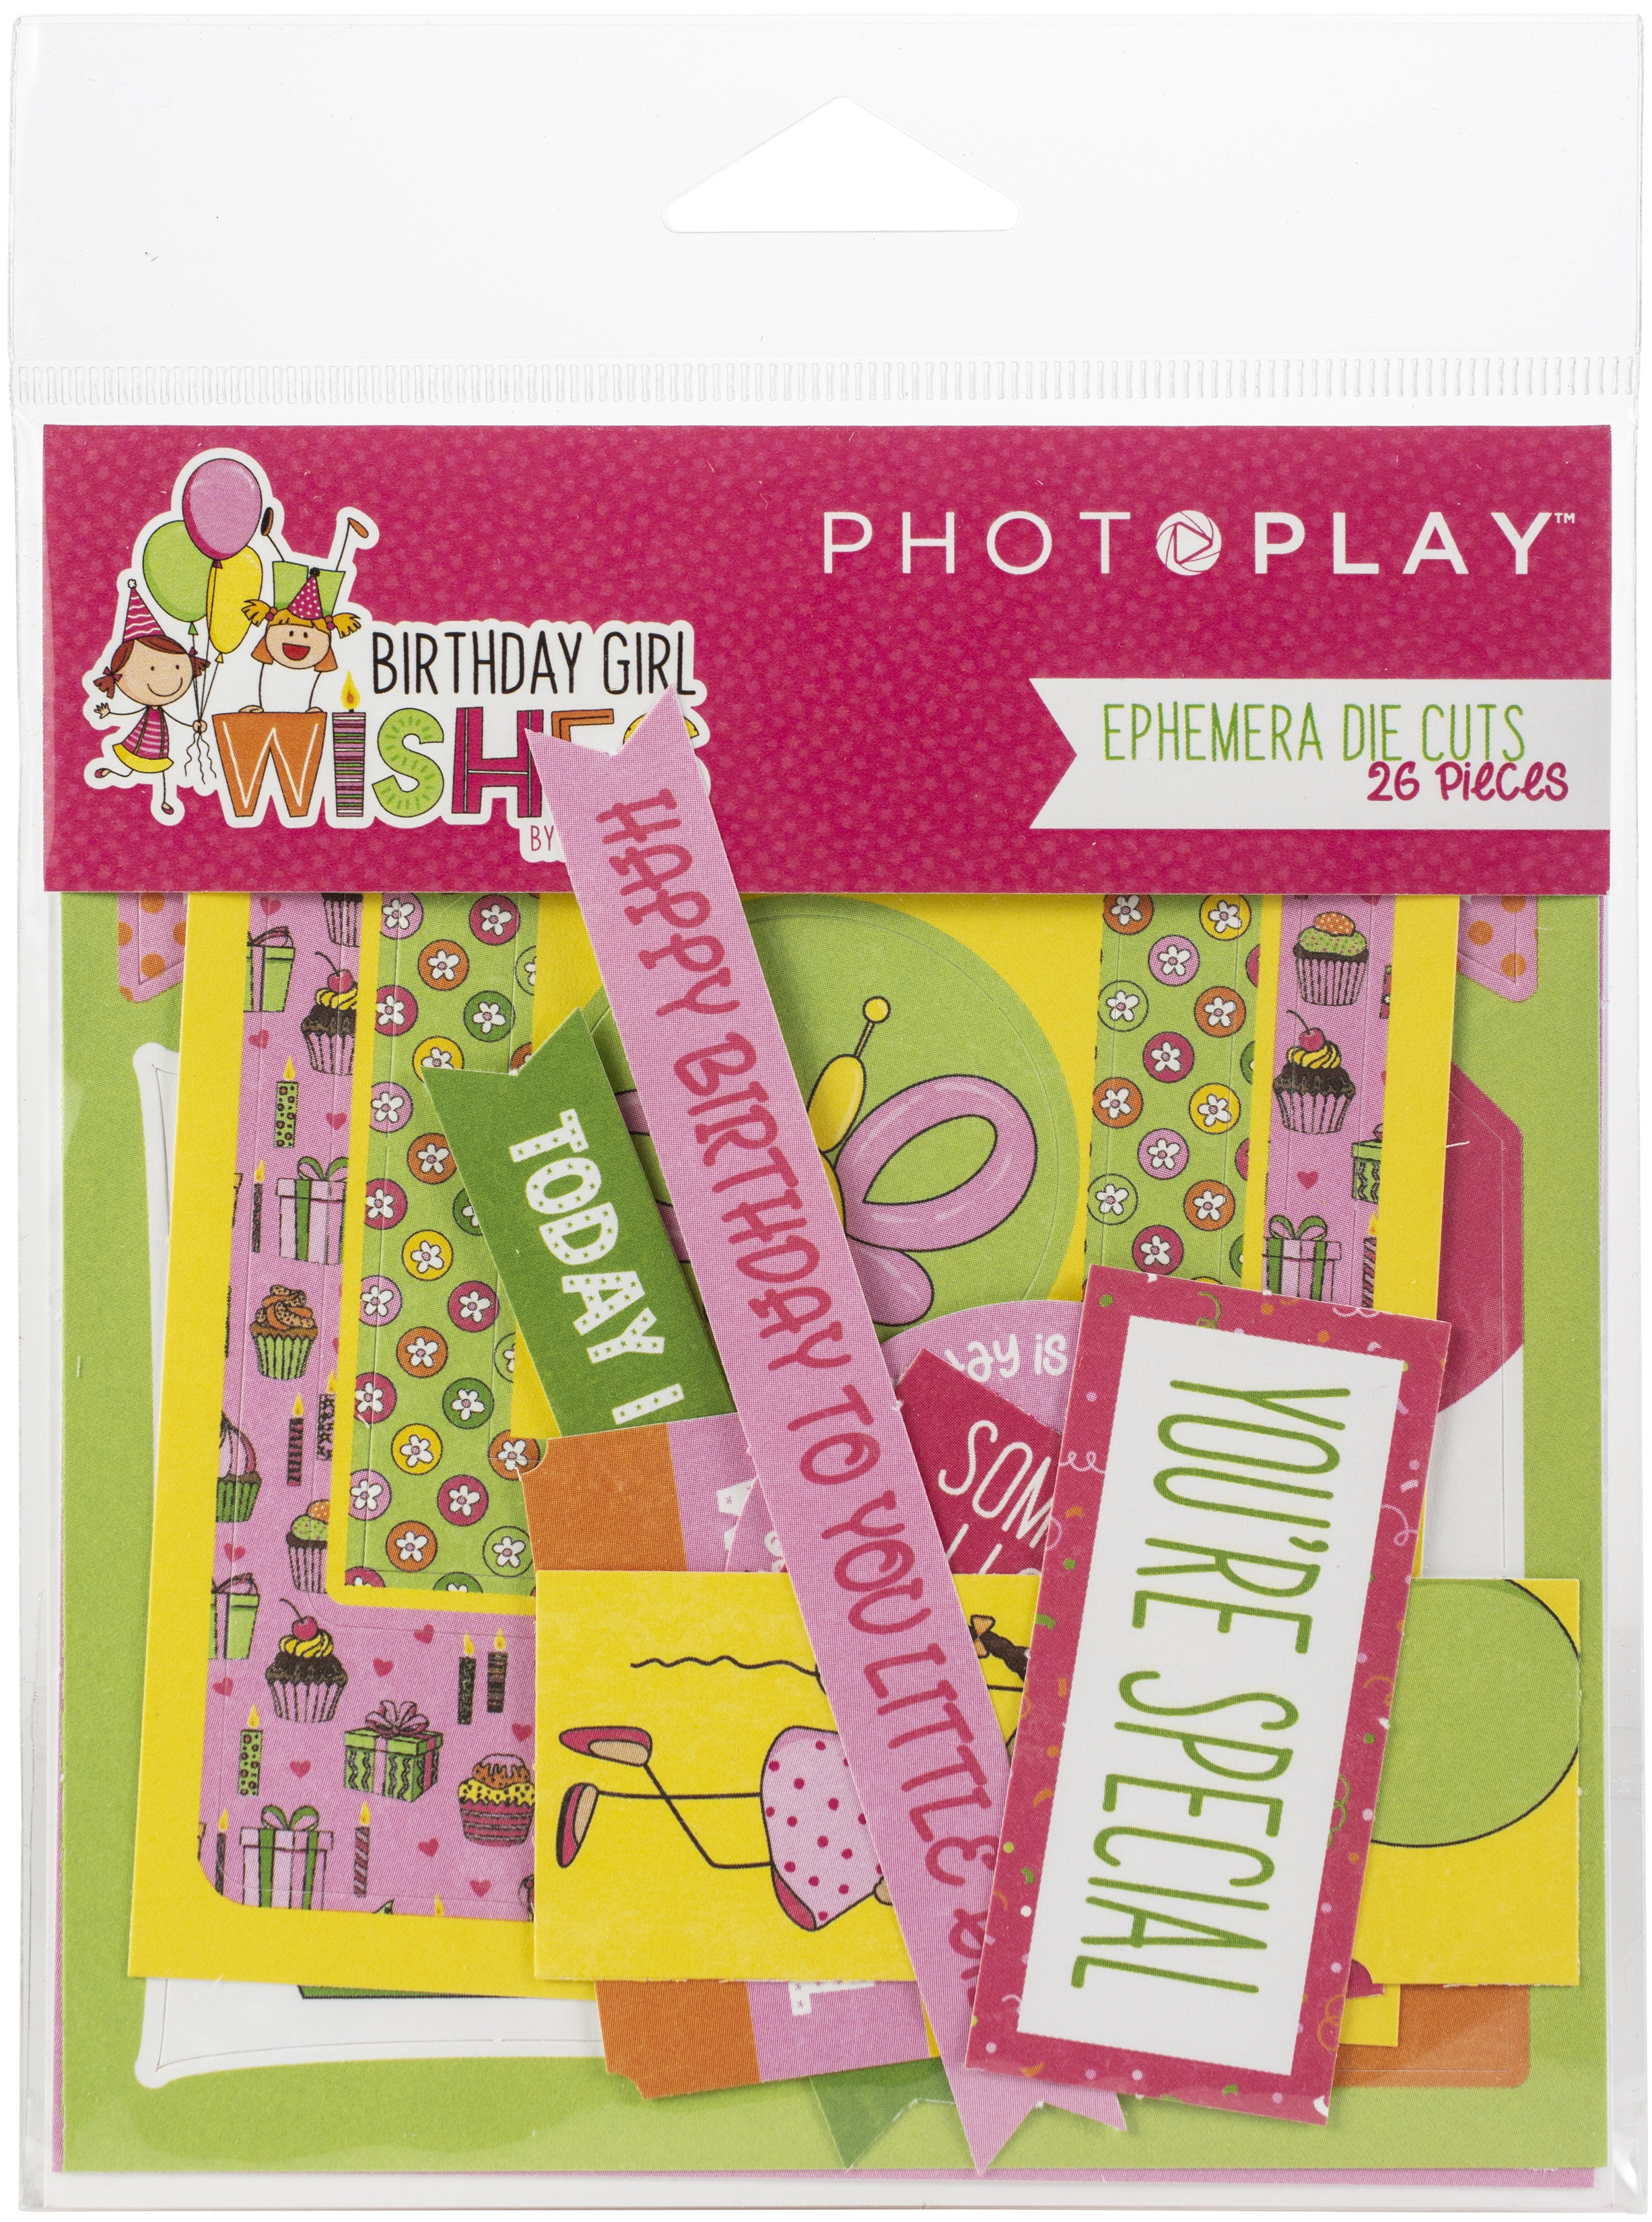 Birthday Girl Wishes Ephemera Cardstock Die-Cuts 26/Pkg-